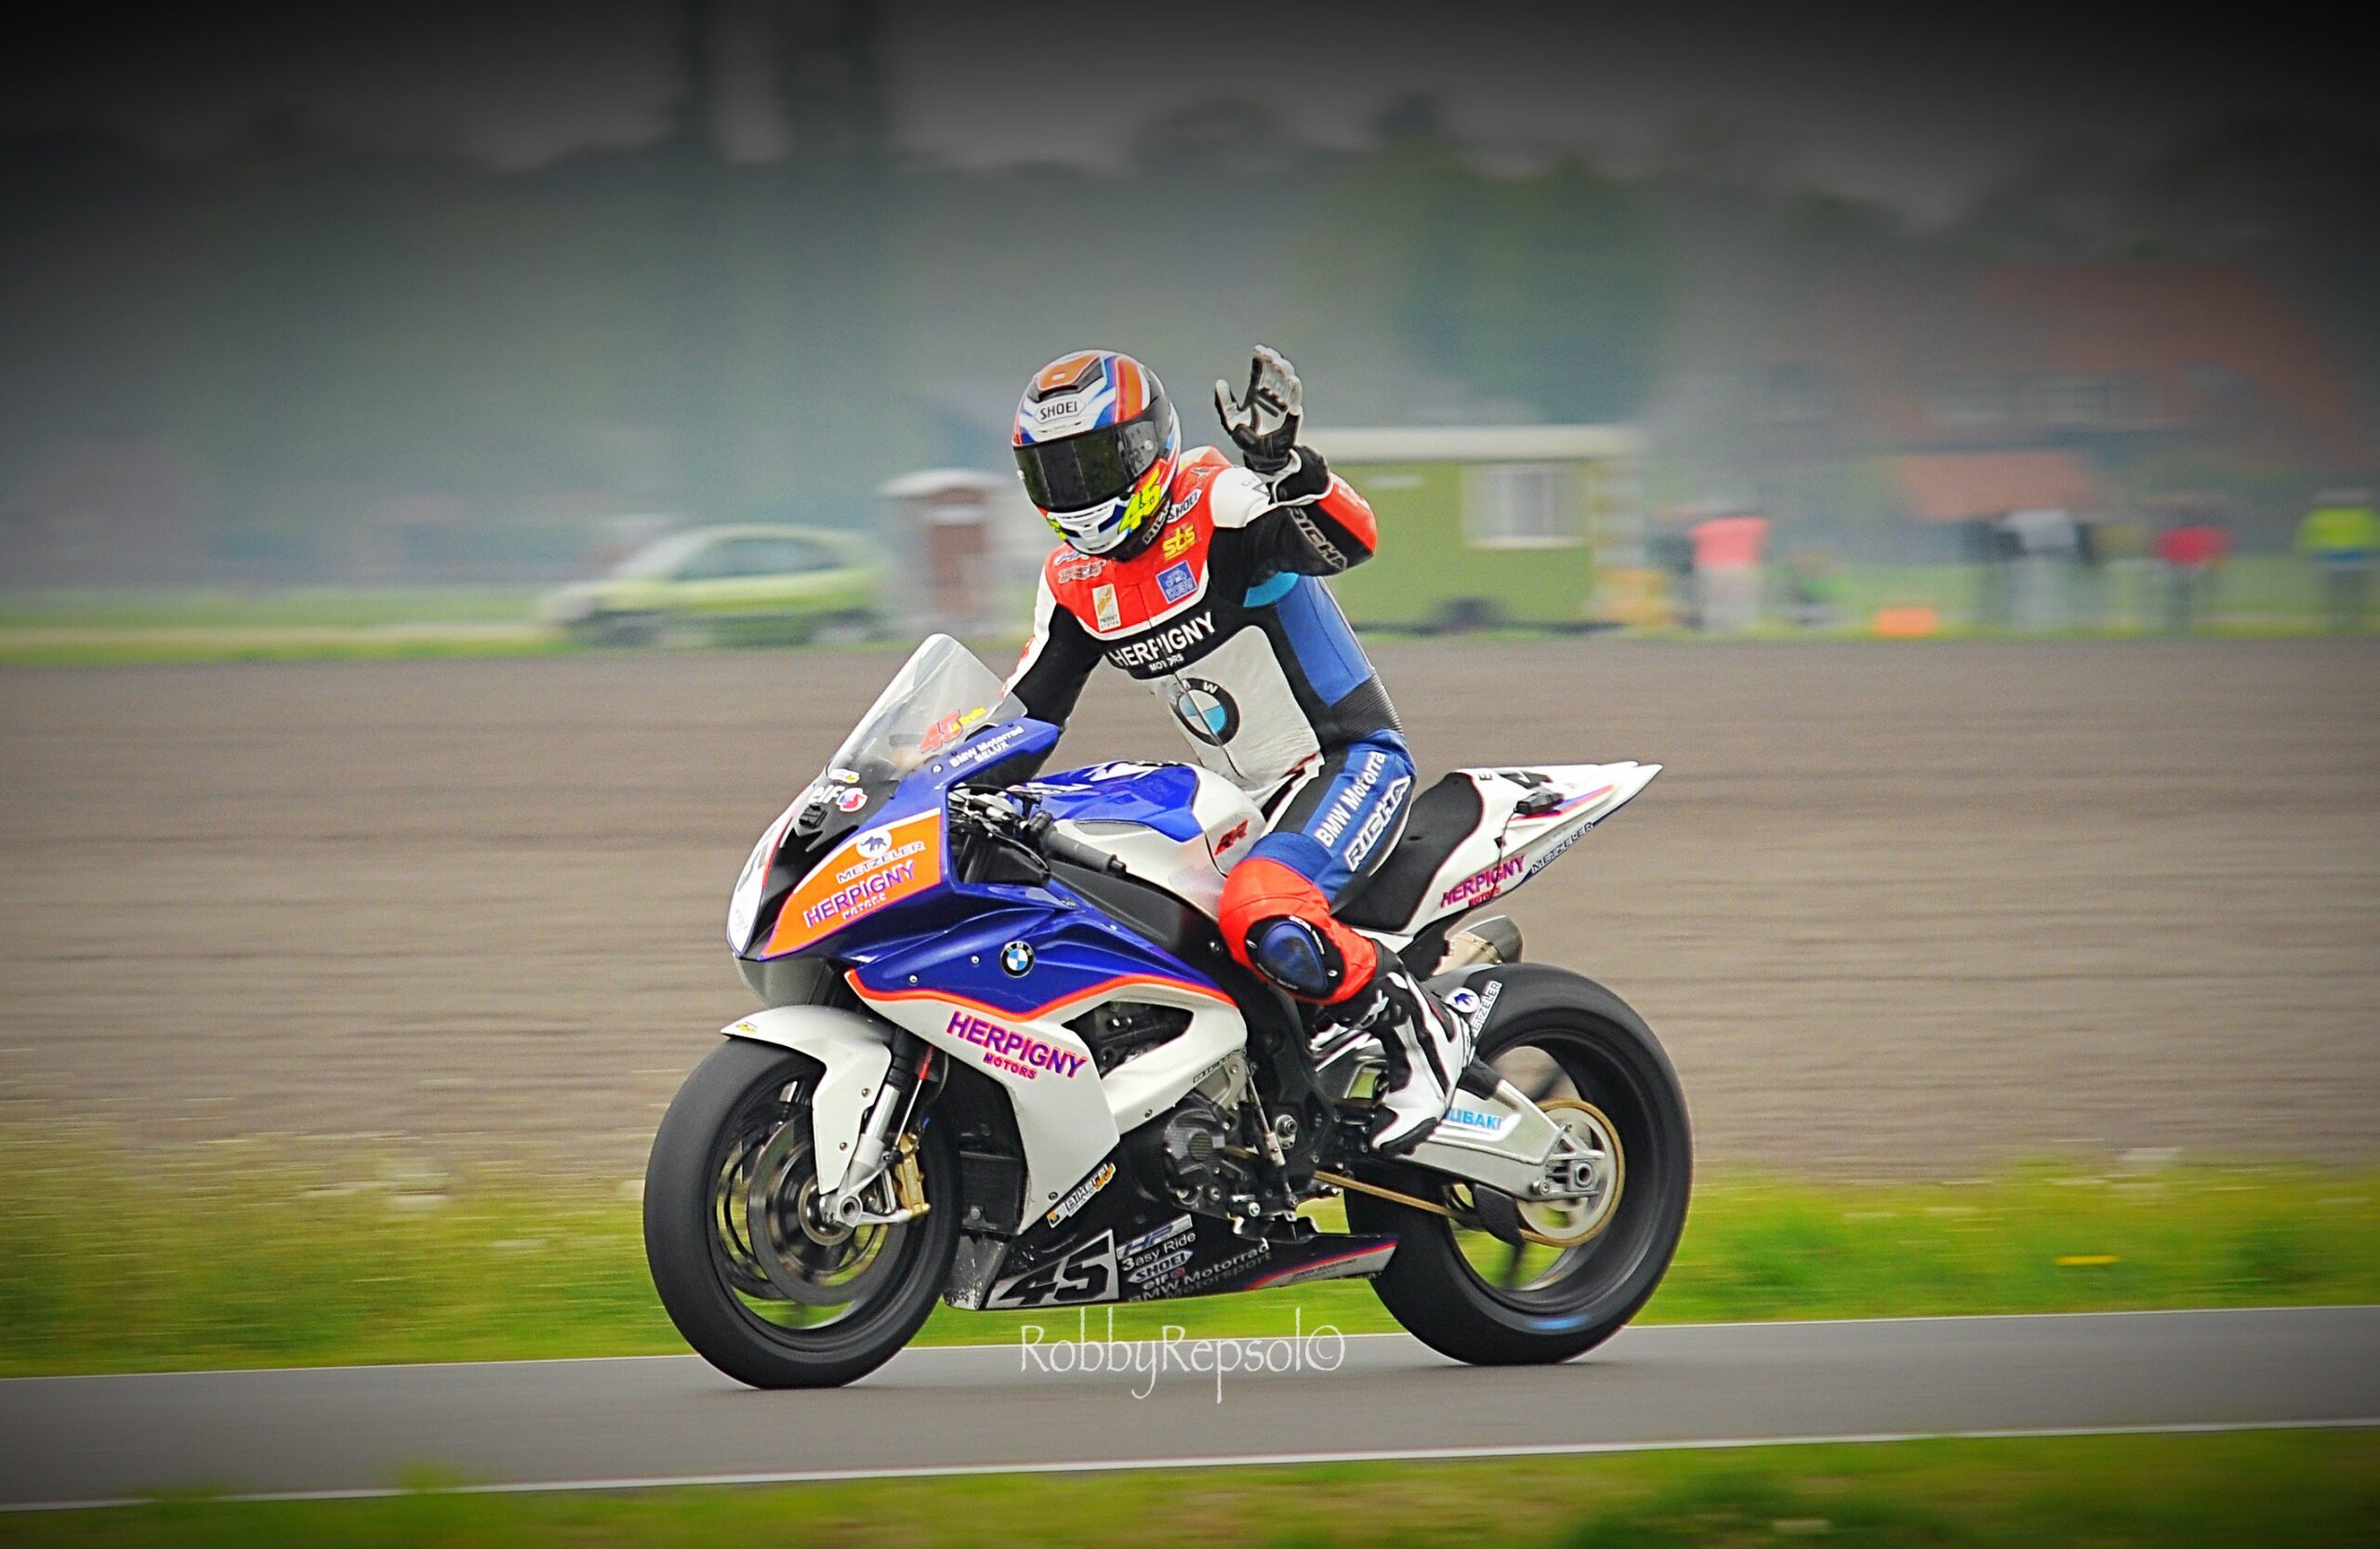 IRRC Hengelo – Sebastien Le Grelle Dominates Opening IRRC Superbike Encounter